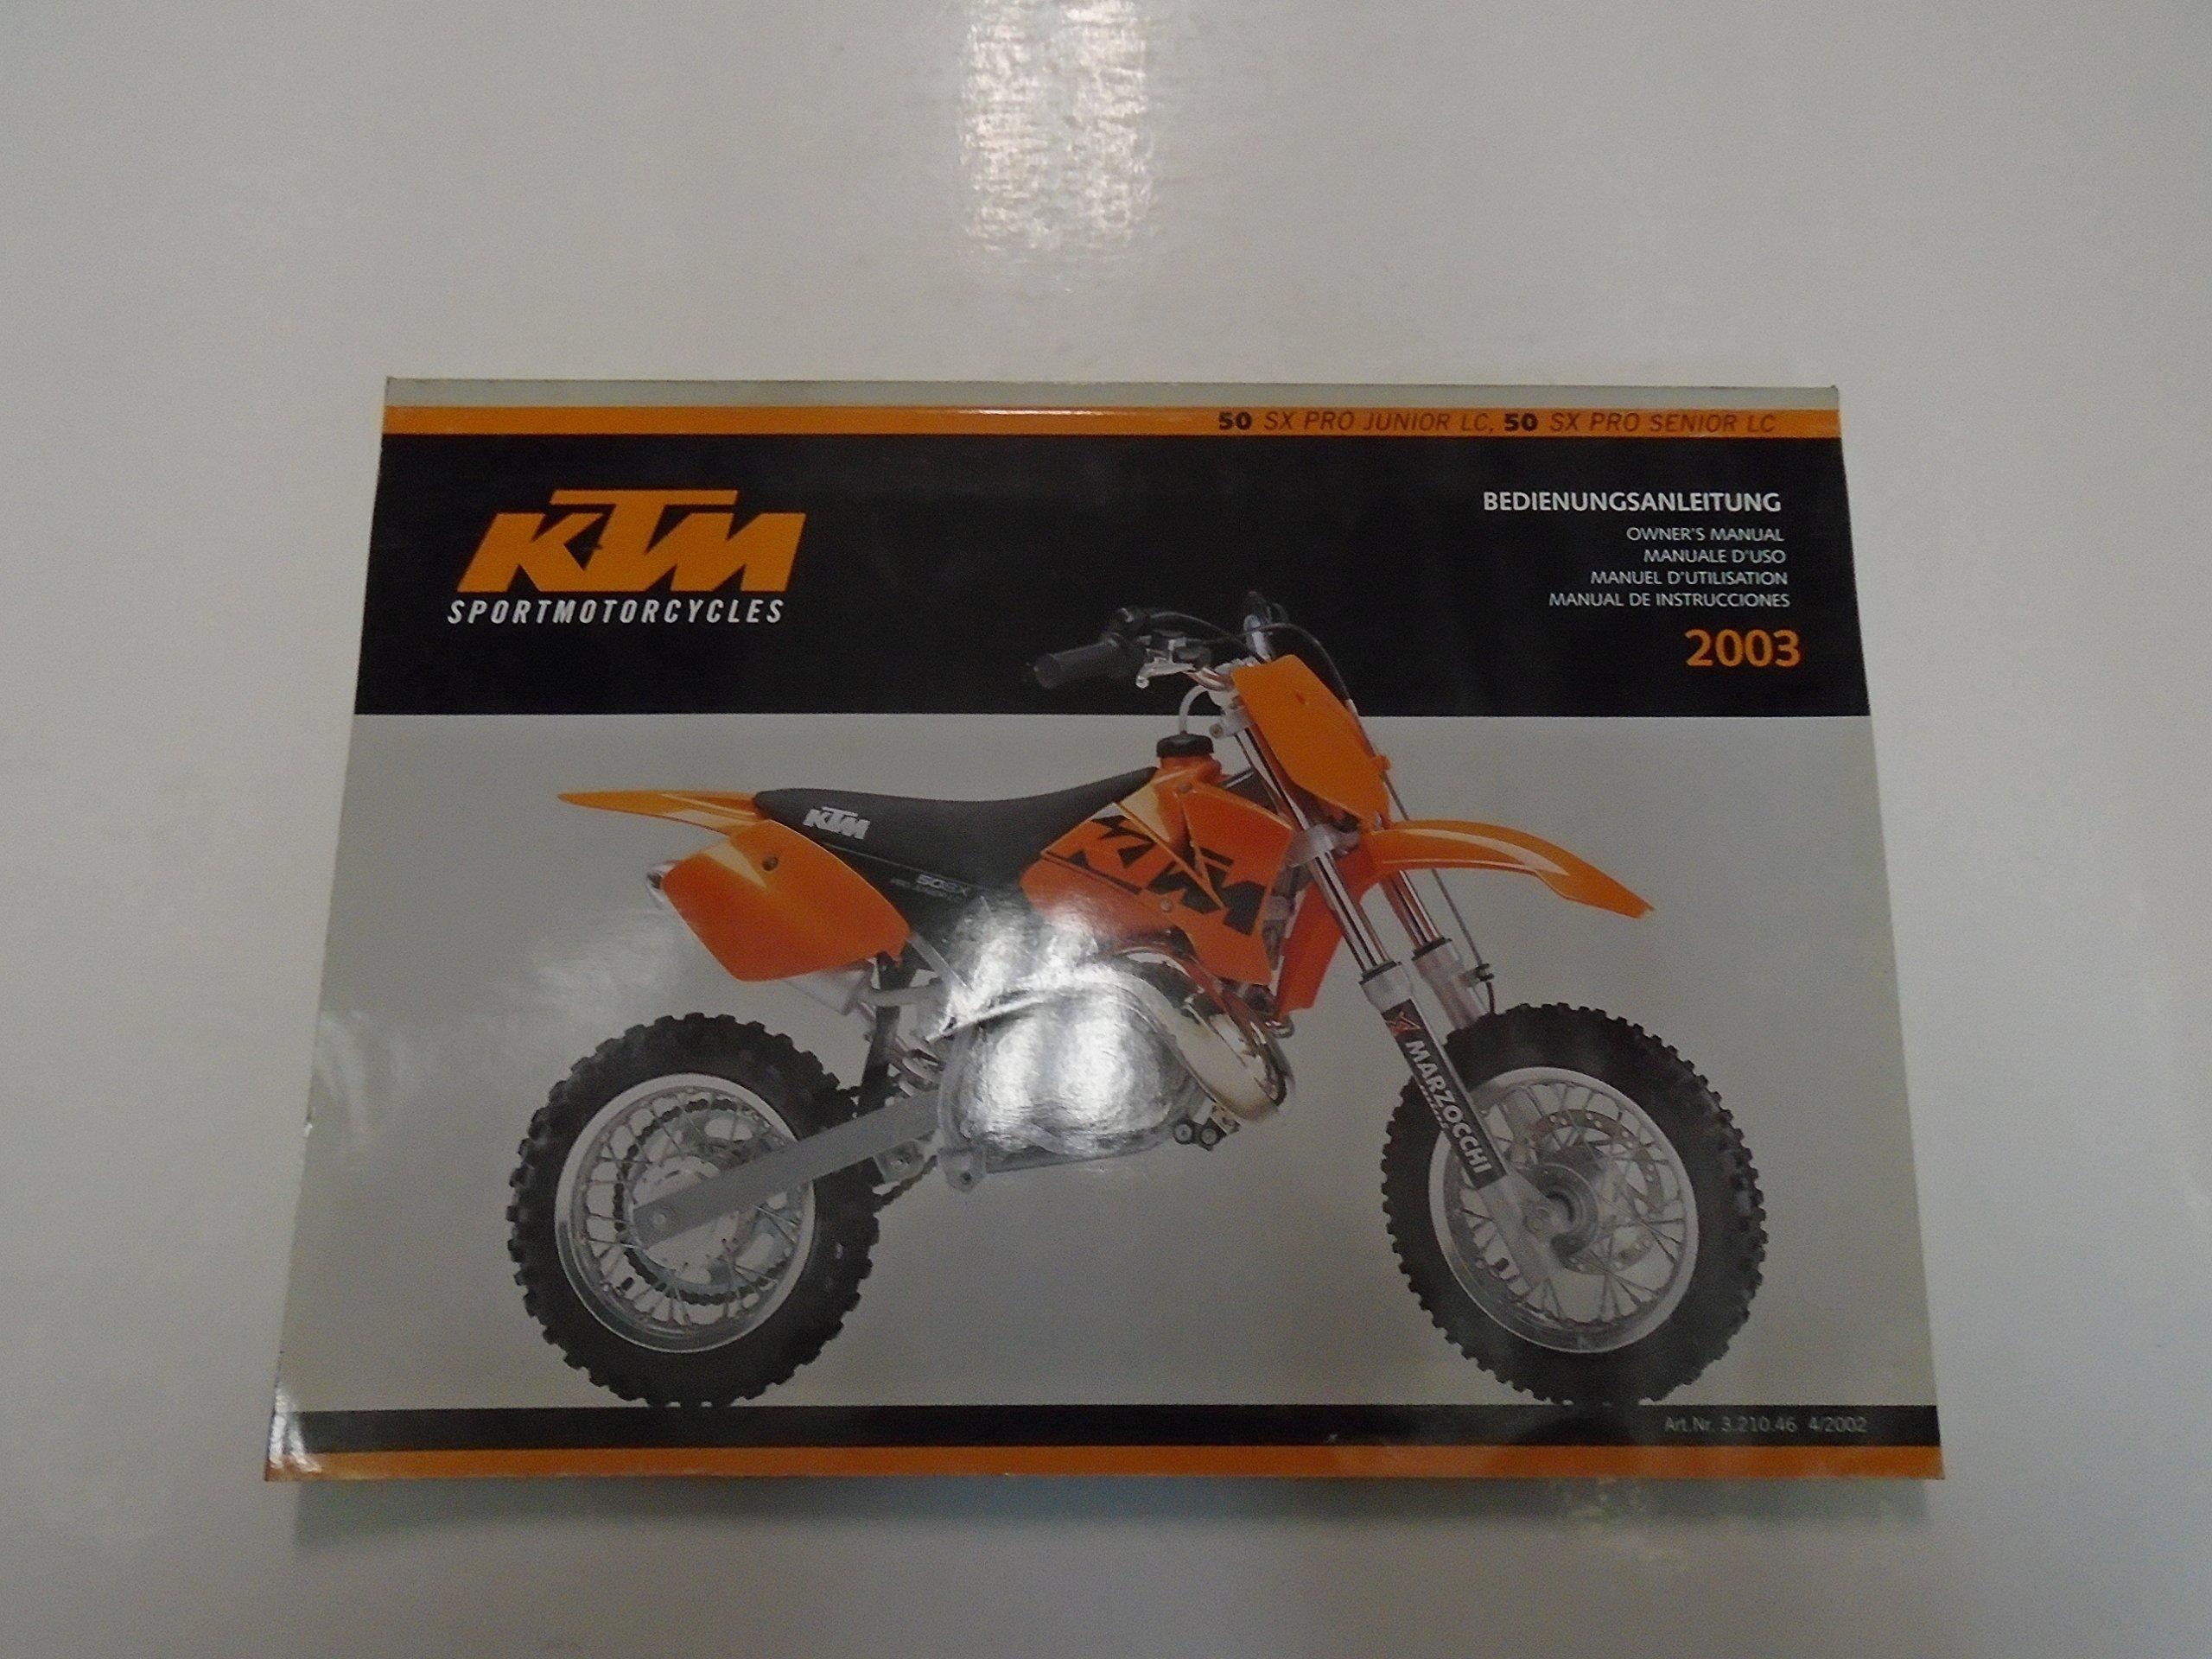 2003 ktm 50 sx pro junior lc 50 sx pro senior lc owners manual minor rh amazon com KTM 50 Junior Specs KTM 50 Sxs Parts